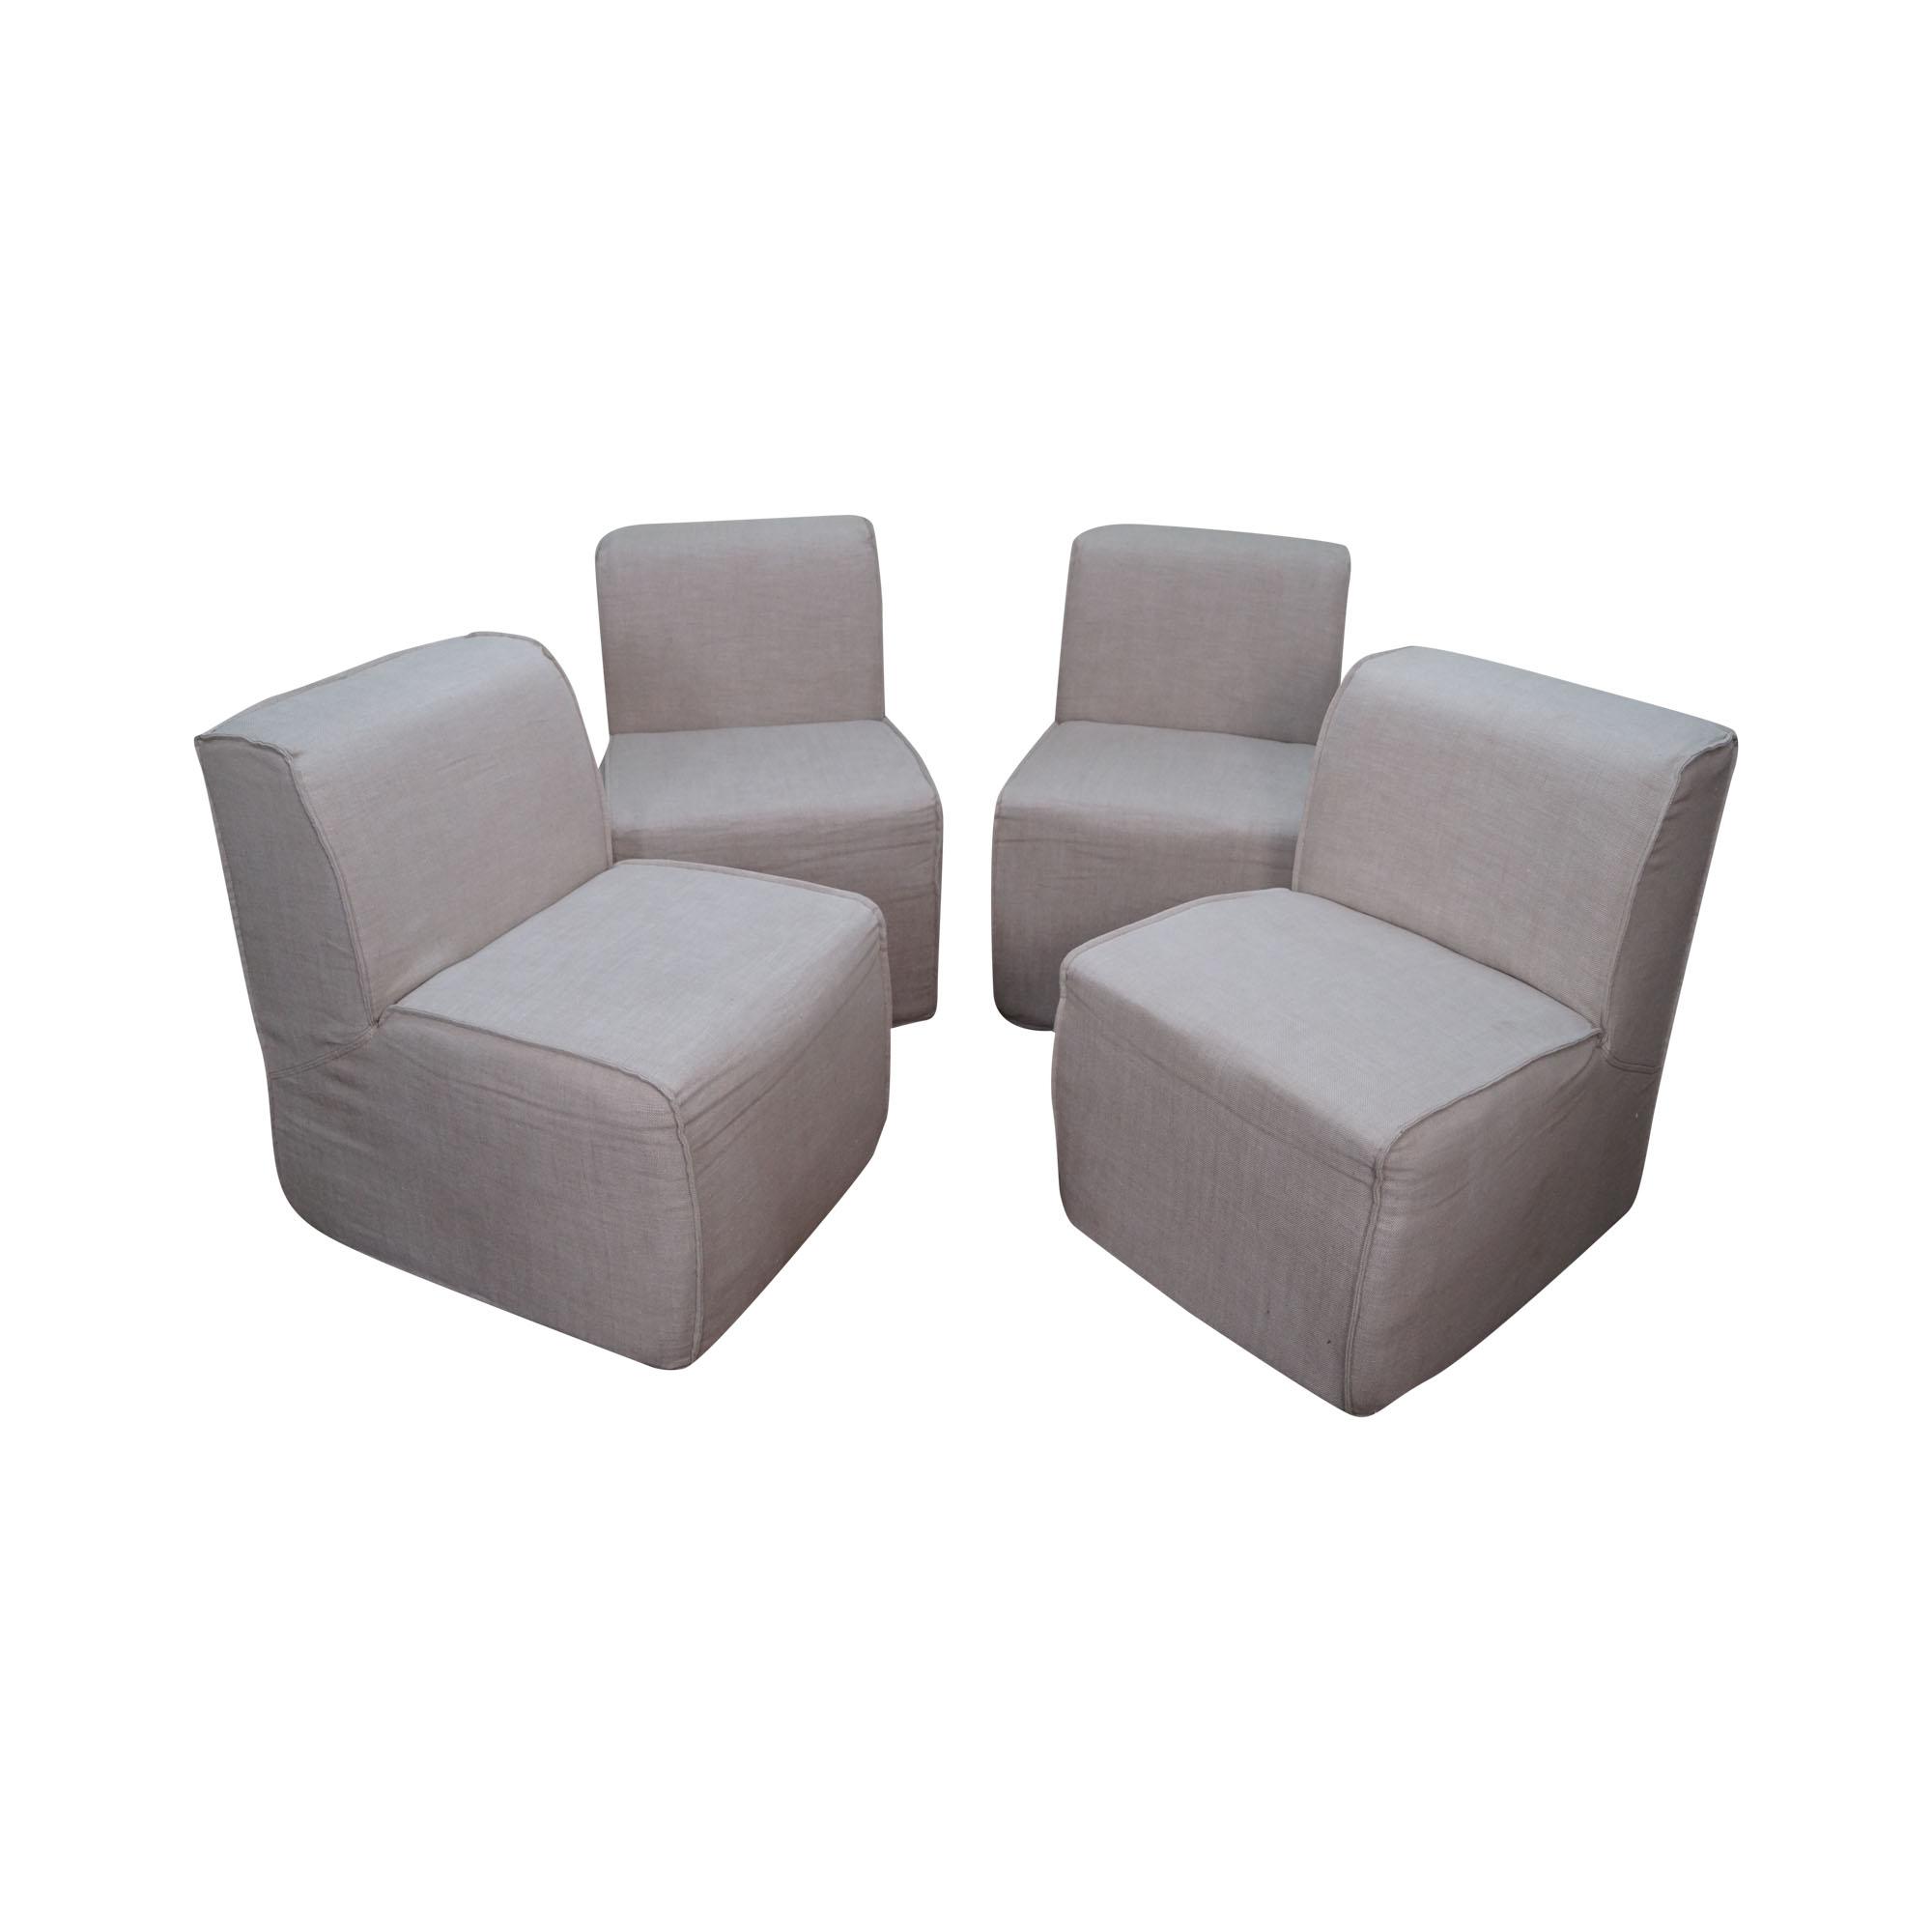 Restoration Hardware Bruno Side Chairs Set of 4